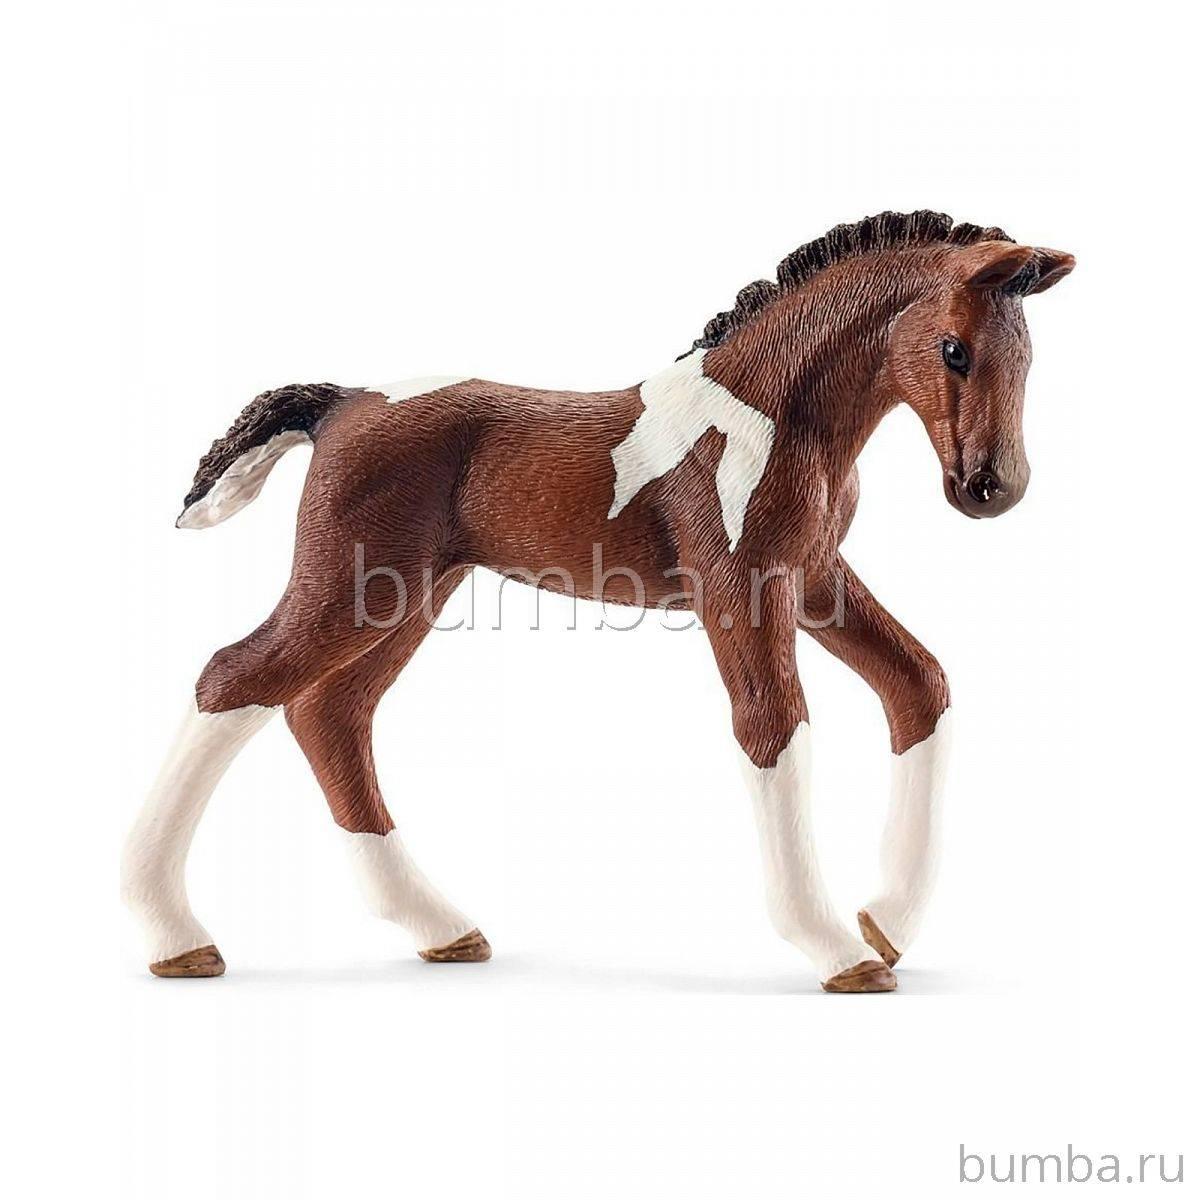 Темперамент и нрав лошадей